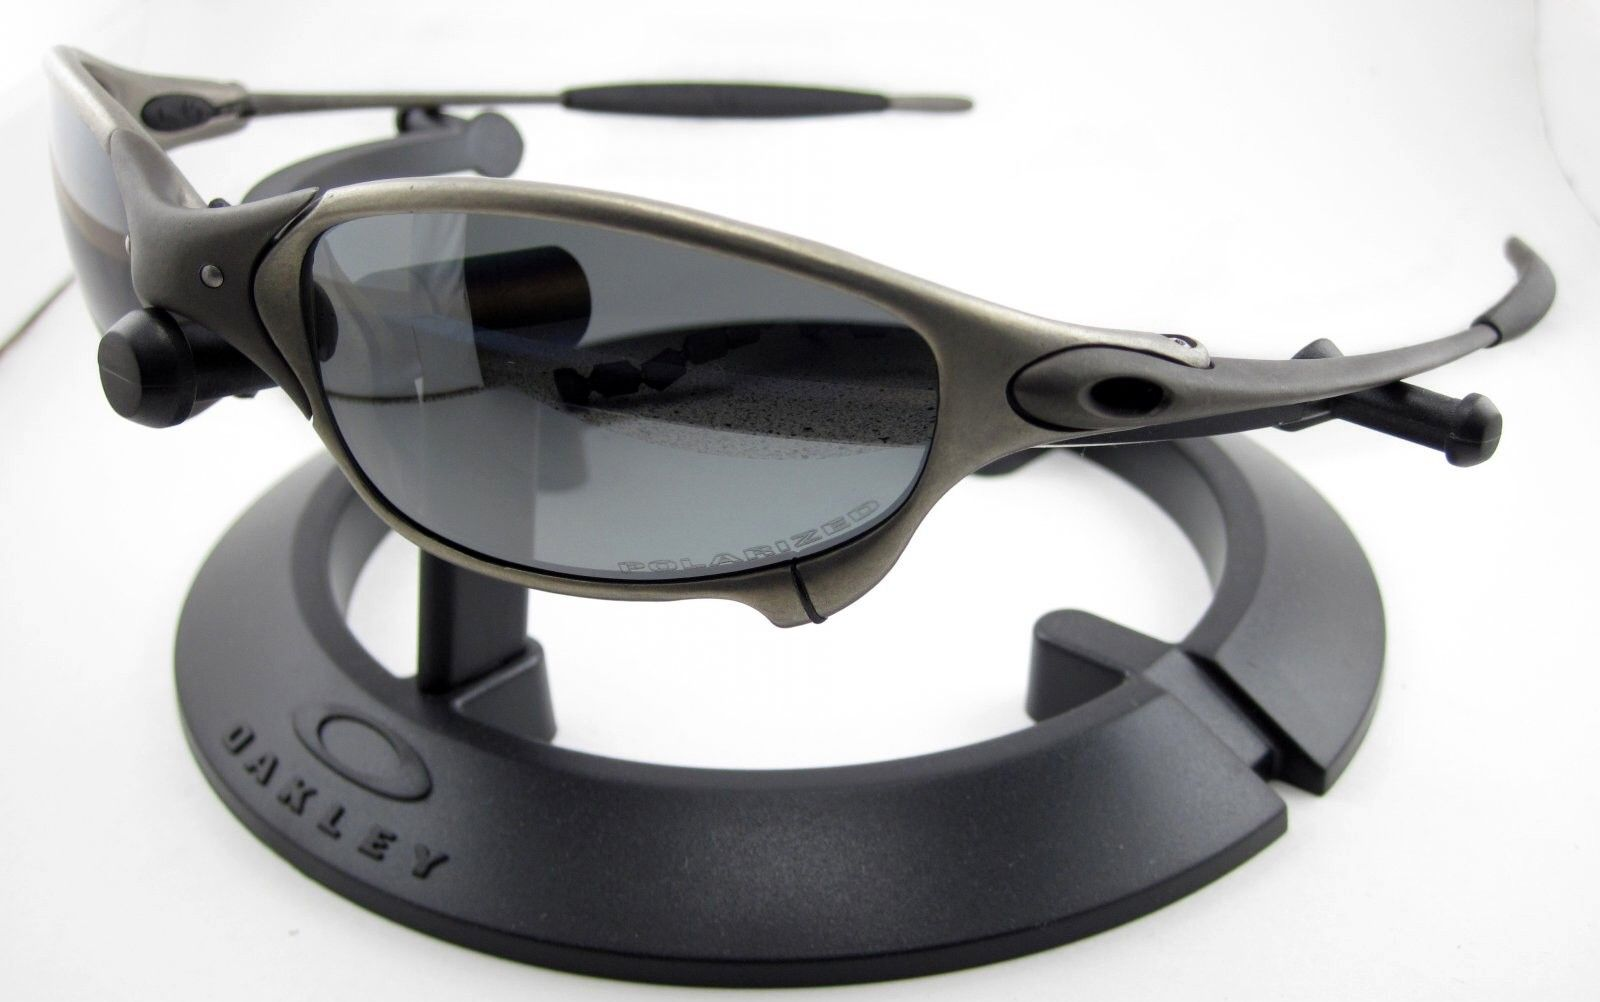 Custom Ti02 Juliet - Photo%20Aug%2008%2C%203%2006%2056%20PM.jpg